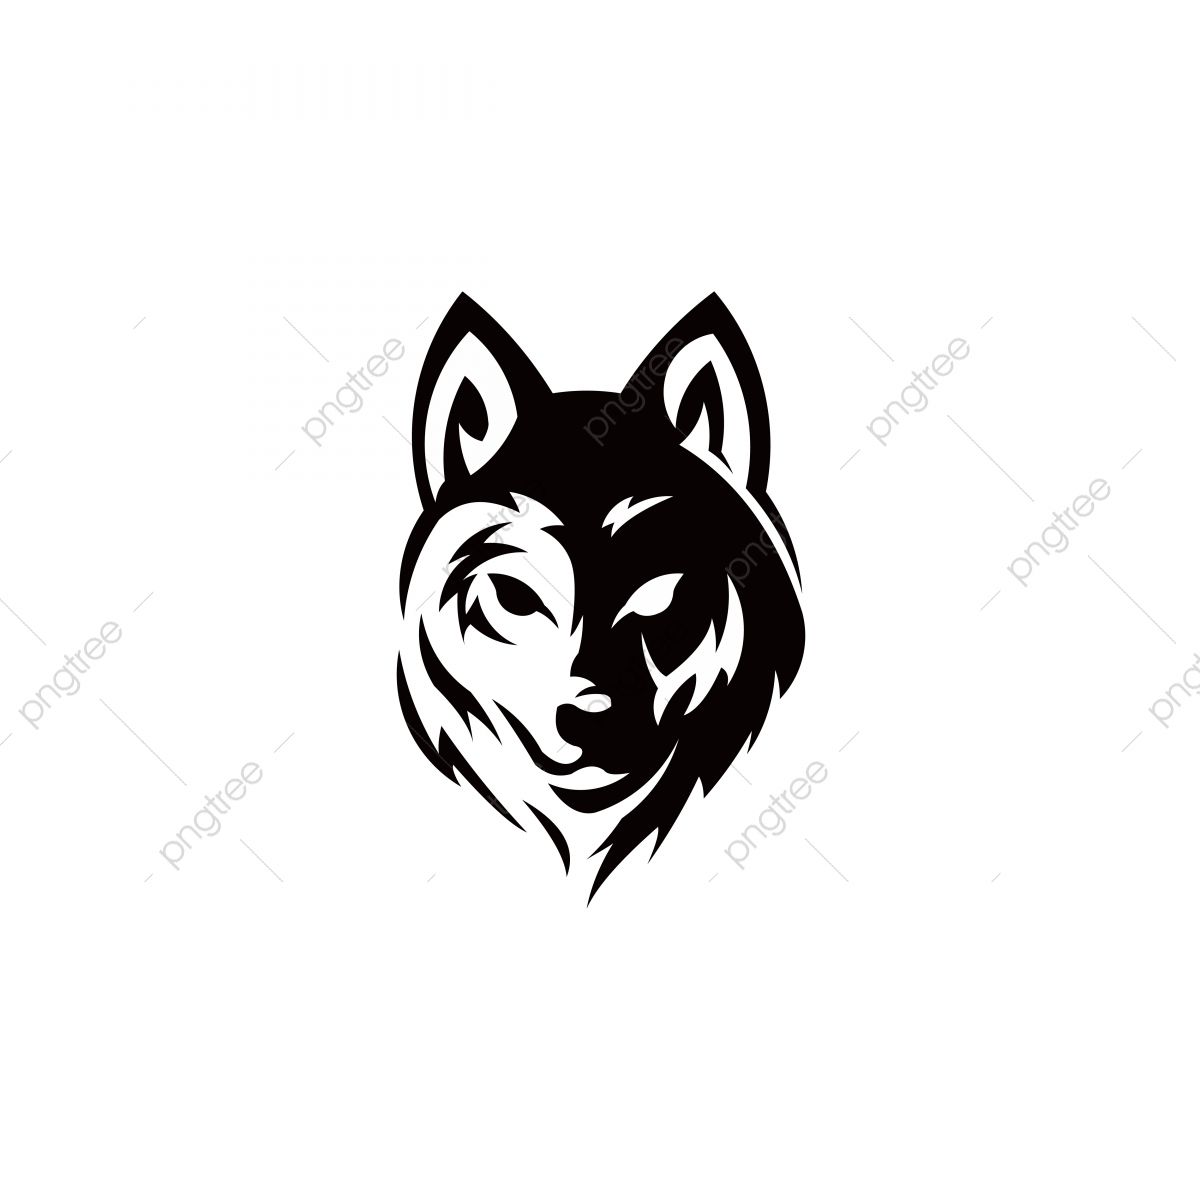 Lobo Parafuso Emblema Mascote Silhueta Logotipo Modelo Para Caes Vermelhos Modelo De Design De Logotipo Gratis Clitoris De Lobo Logo Icones Imagem Png E Veto Desenho De Logotipo Gratis Modelos De